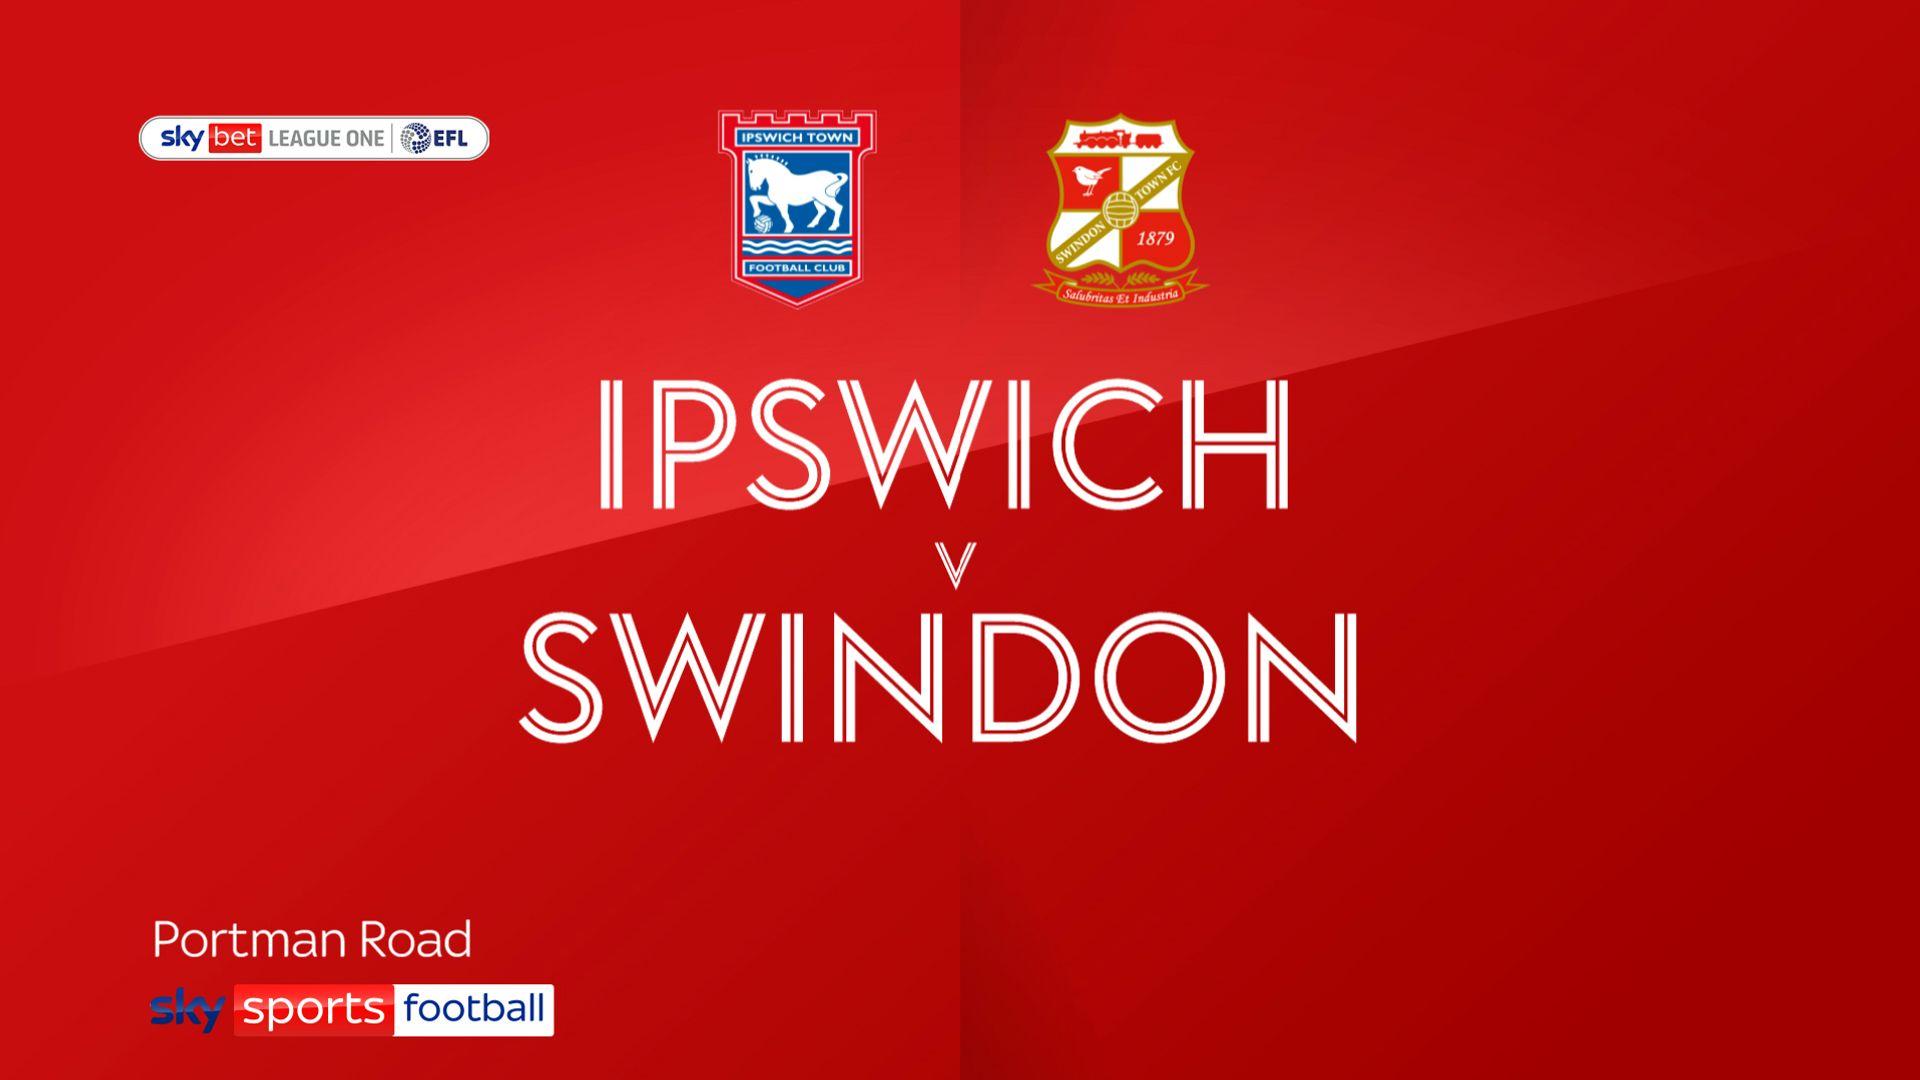 Swindon hold on to beat Ipswich